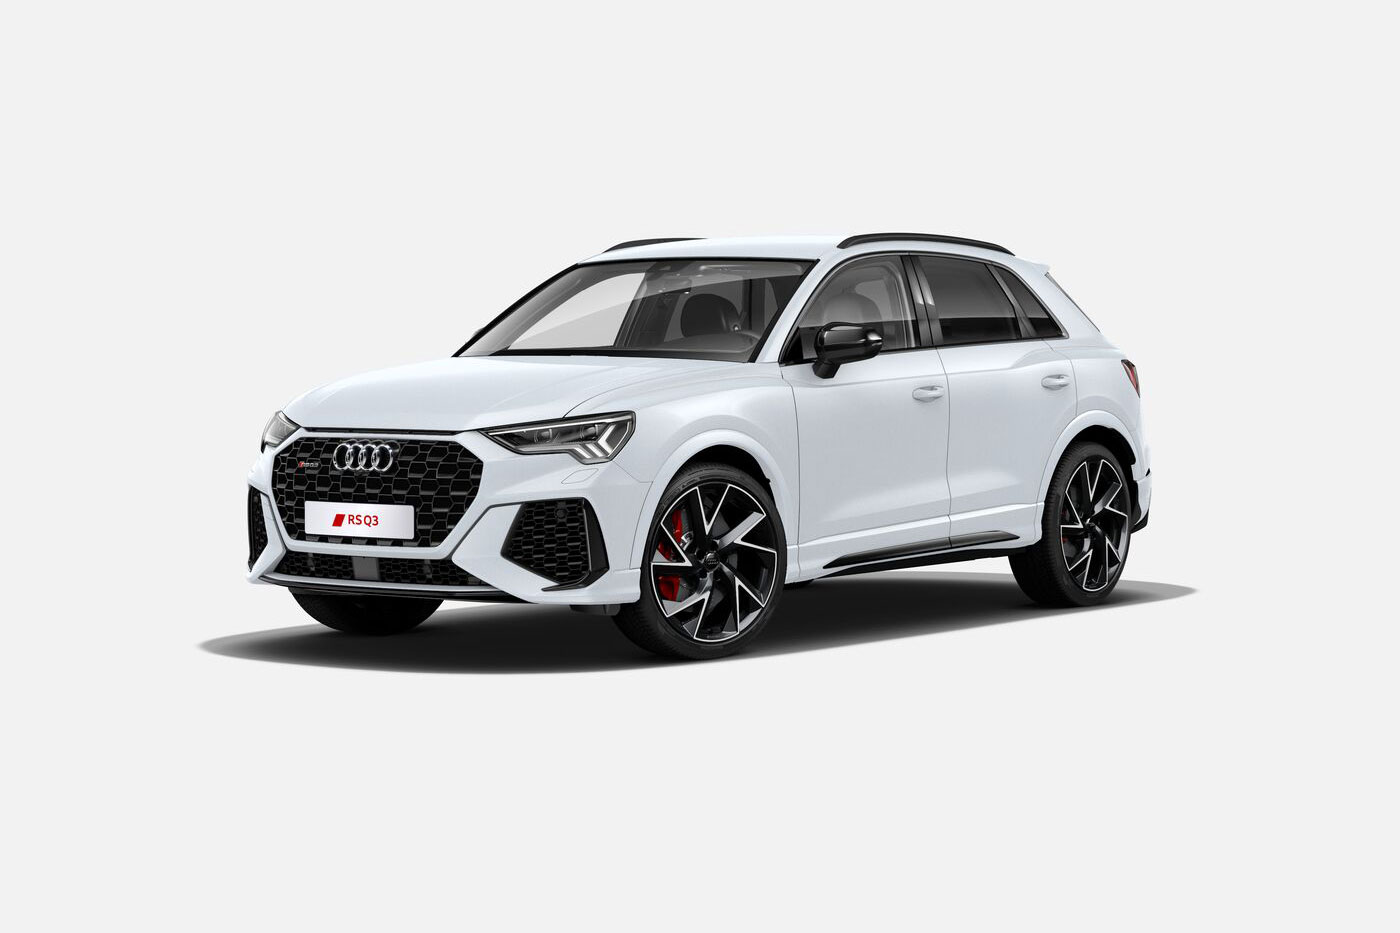 2021 Audi Rs Q3 Tfsi Quattro 2 5l 5cyl Petrol Turbocharged Automatic Suv